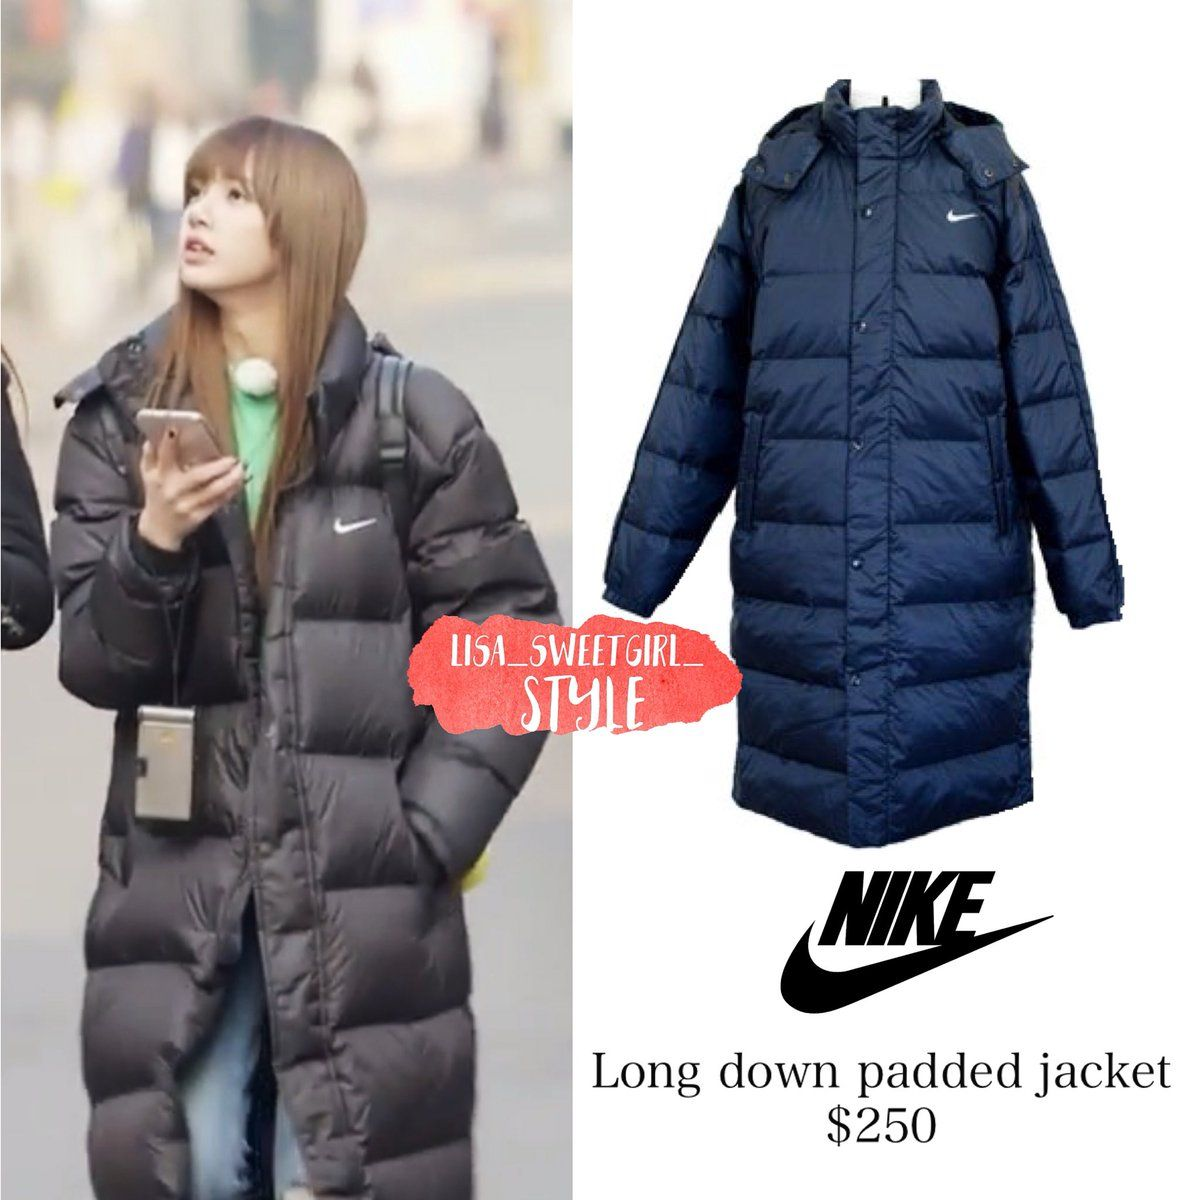 competitive price 29d6d 441e3 Blackpink lisa nike coat jacket parka